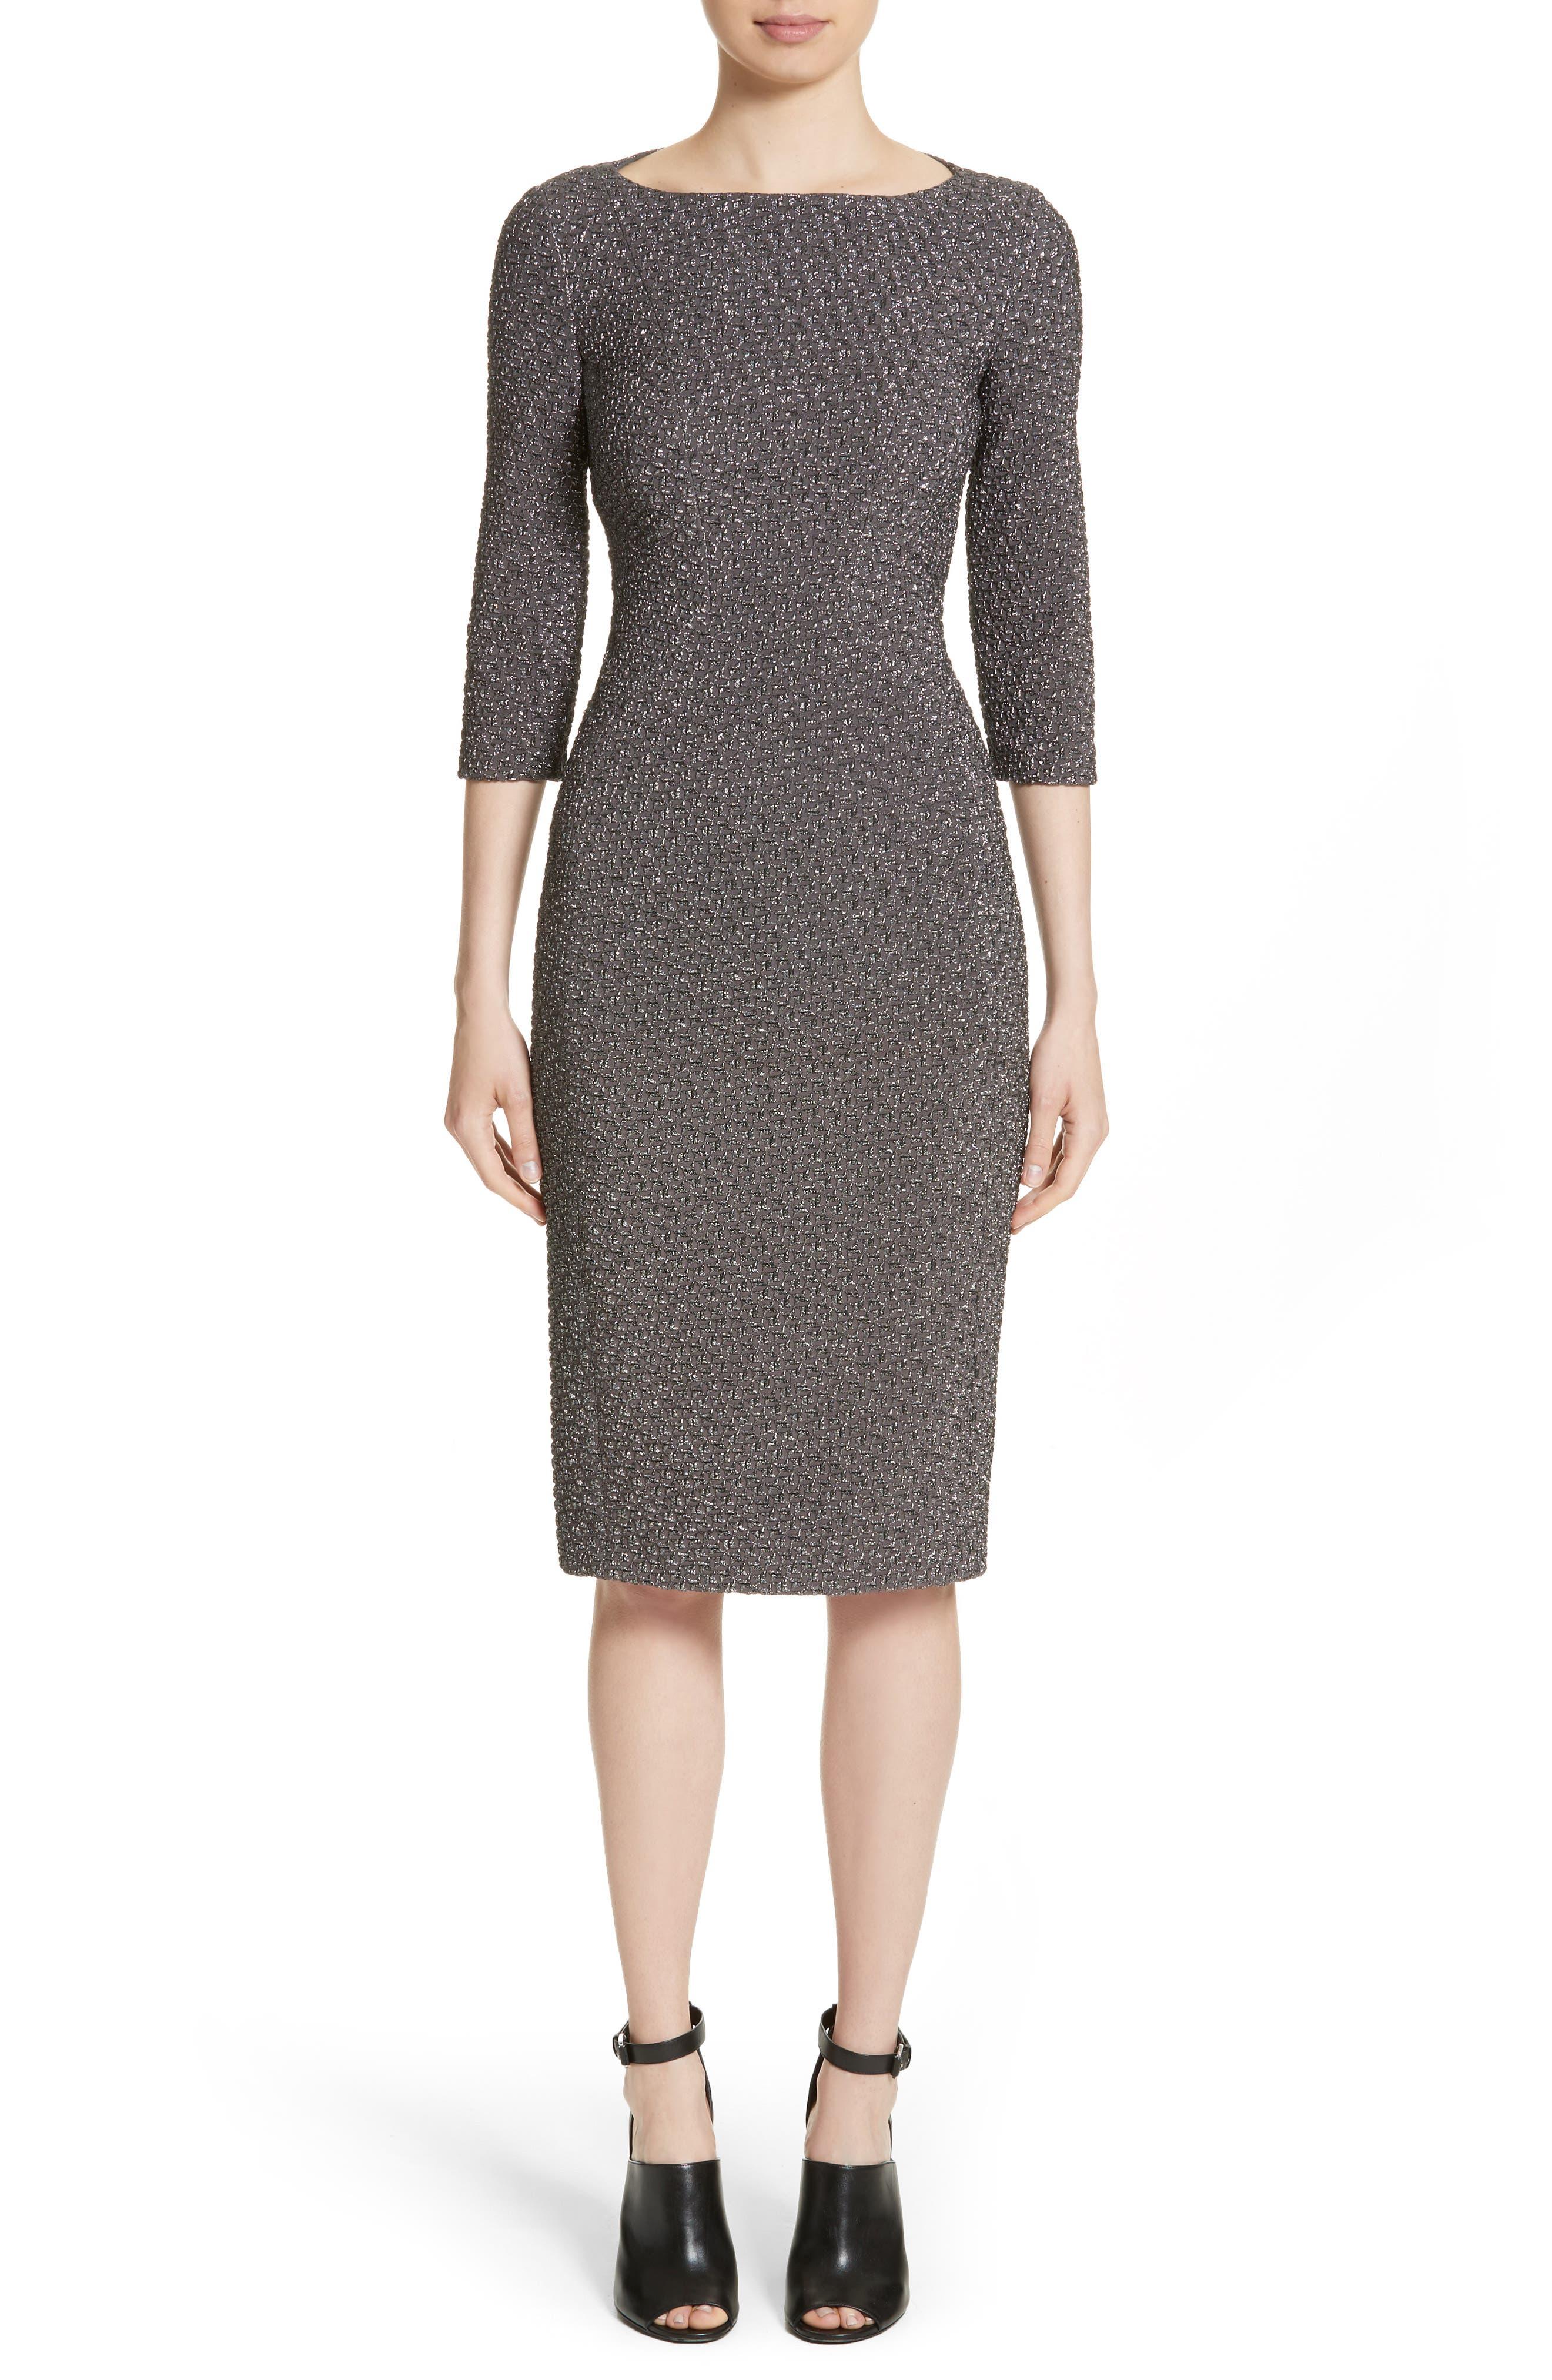 Michael Kors Houndstooth Stretch Metallic Jacquard Sheath Dress